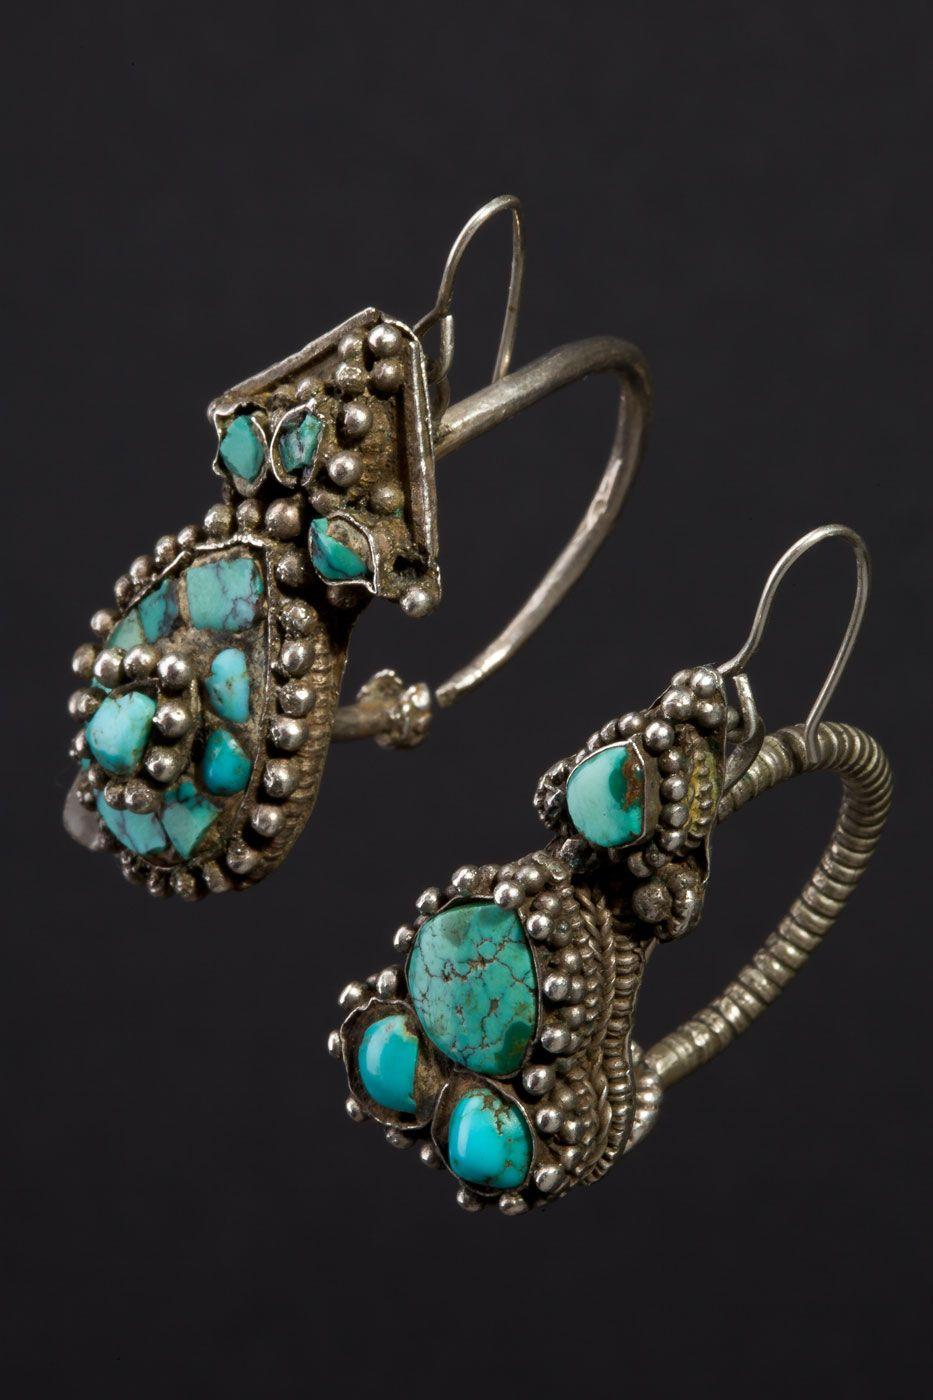 Tibet  Ekbor Earrings; This Type Of Earring Is Worn By Tibetan Women  Either On